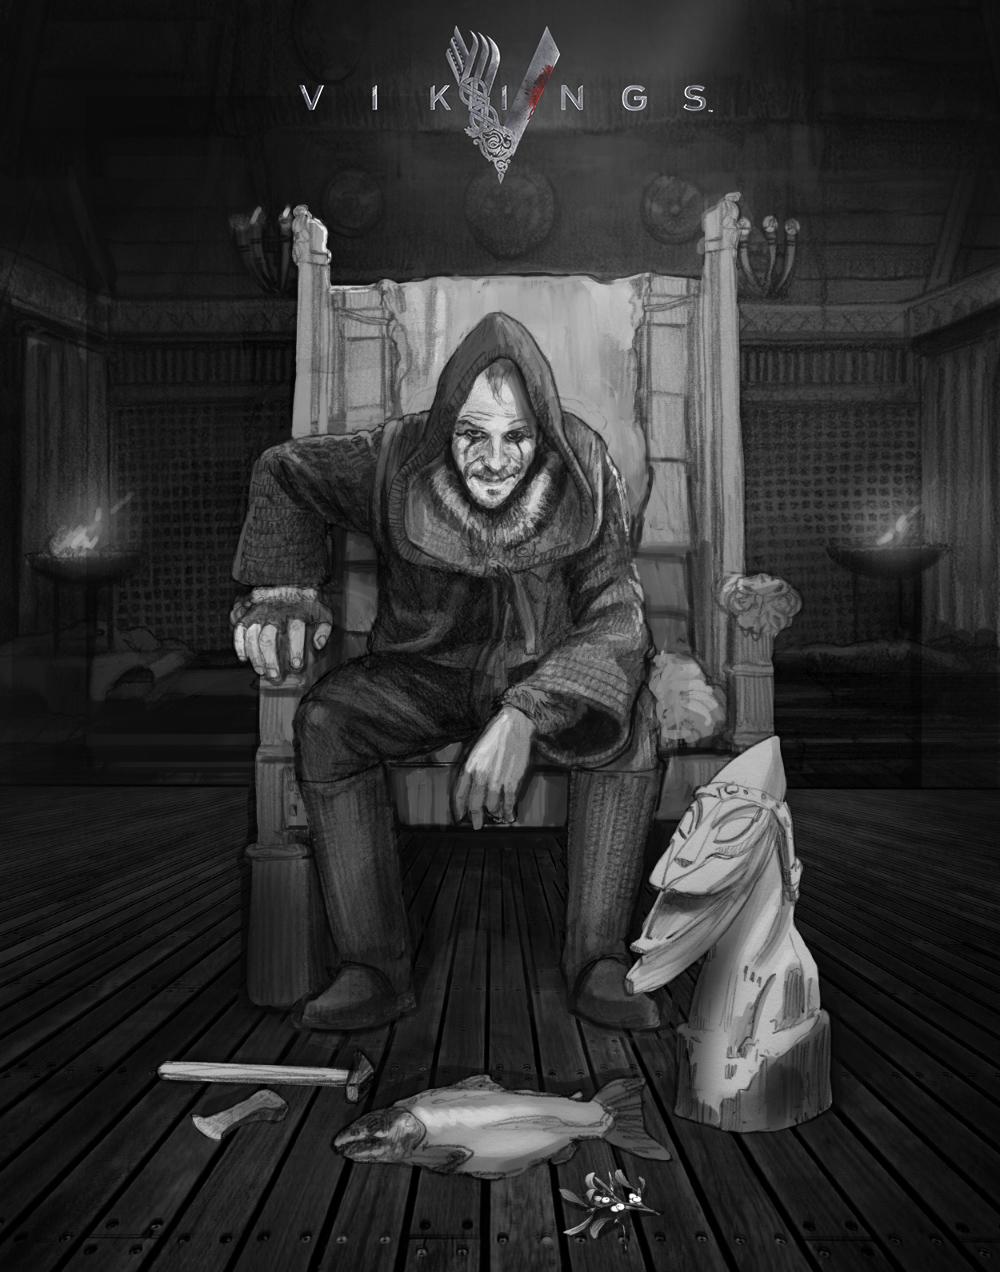 throne_comp_floki_misletoe.jpg